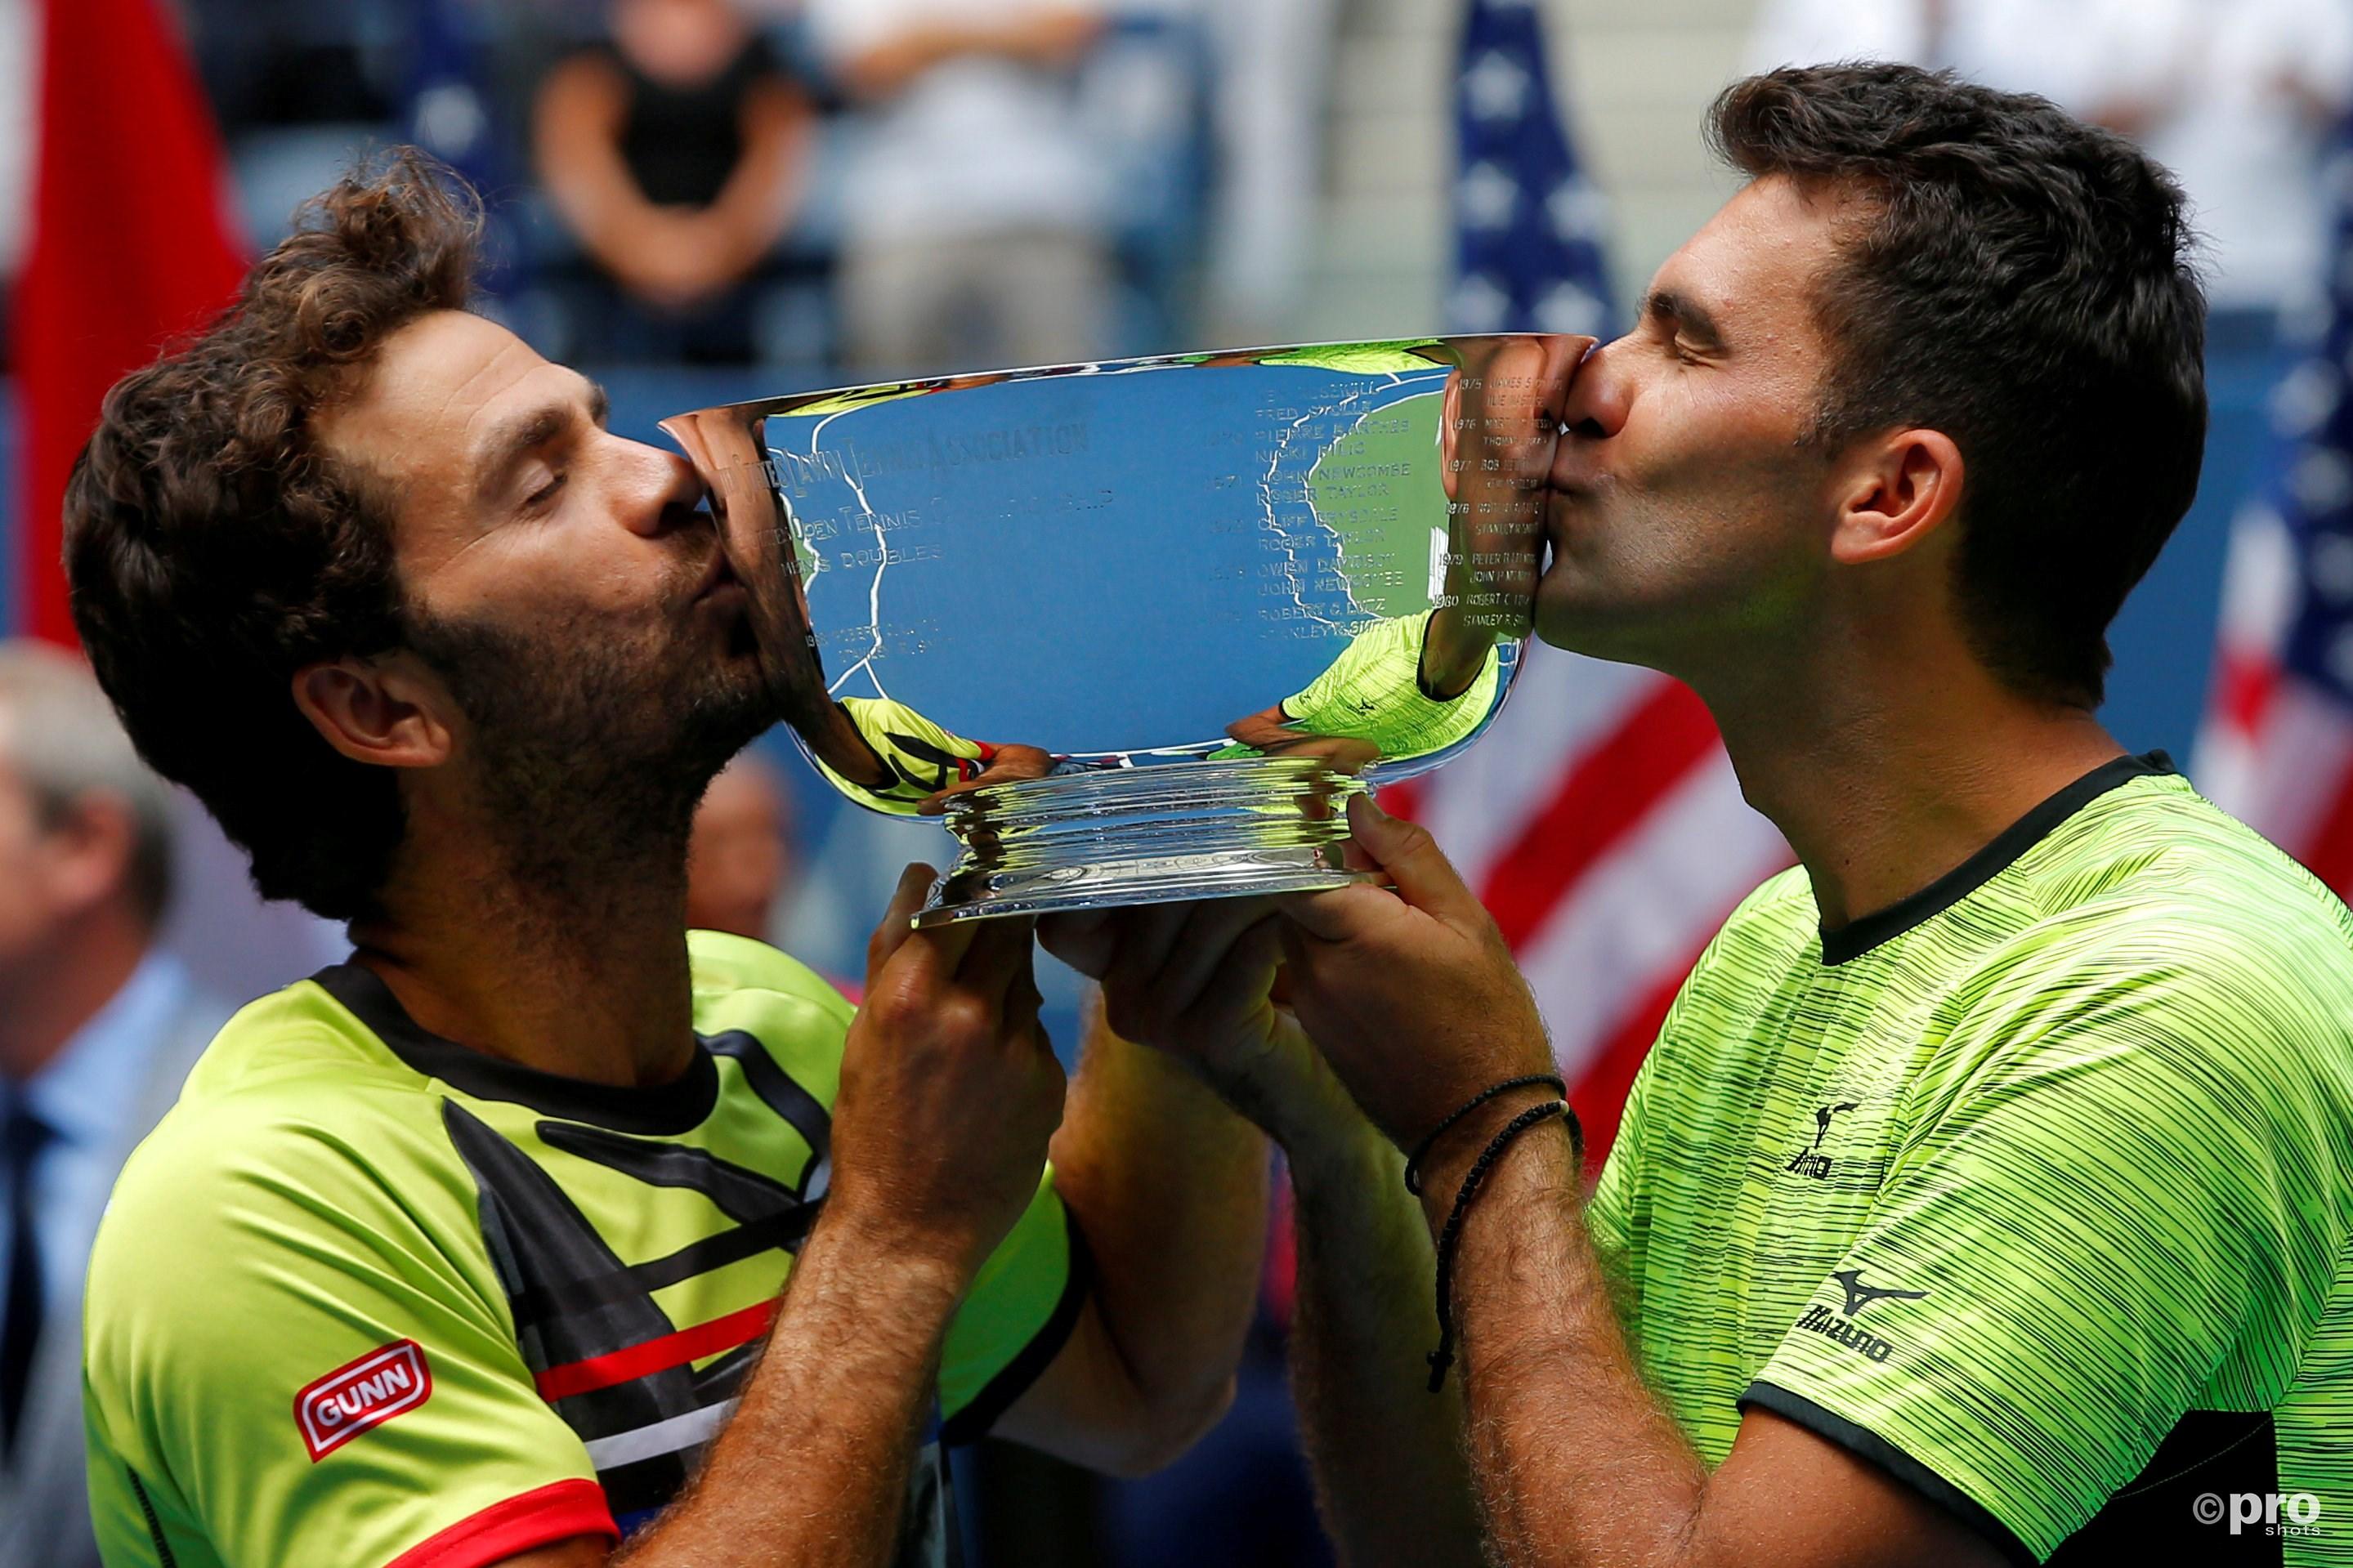 Rojer en Tecau winnen de US Open. (PRO SHOTS/Action Images)